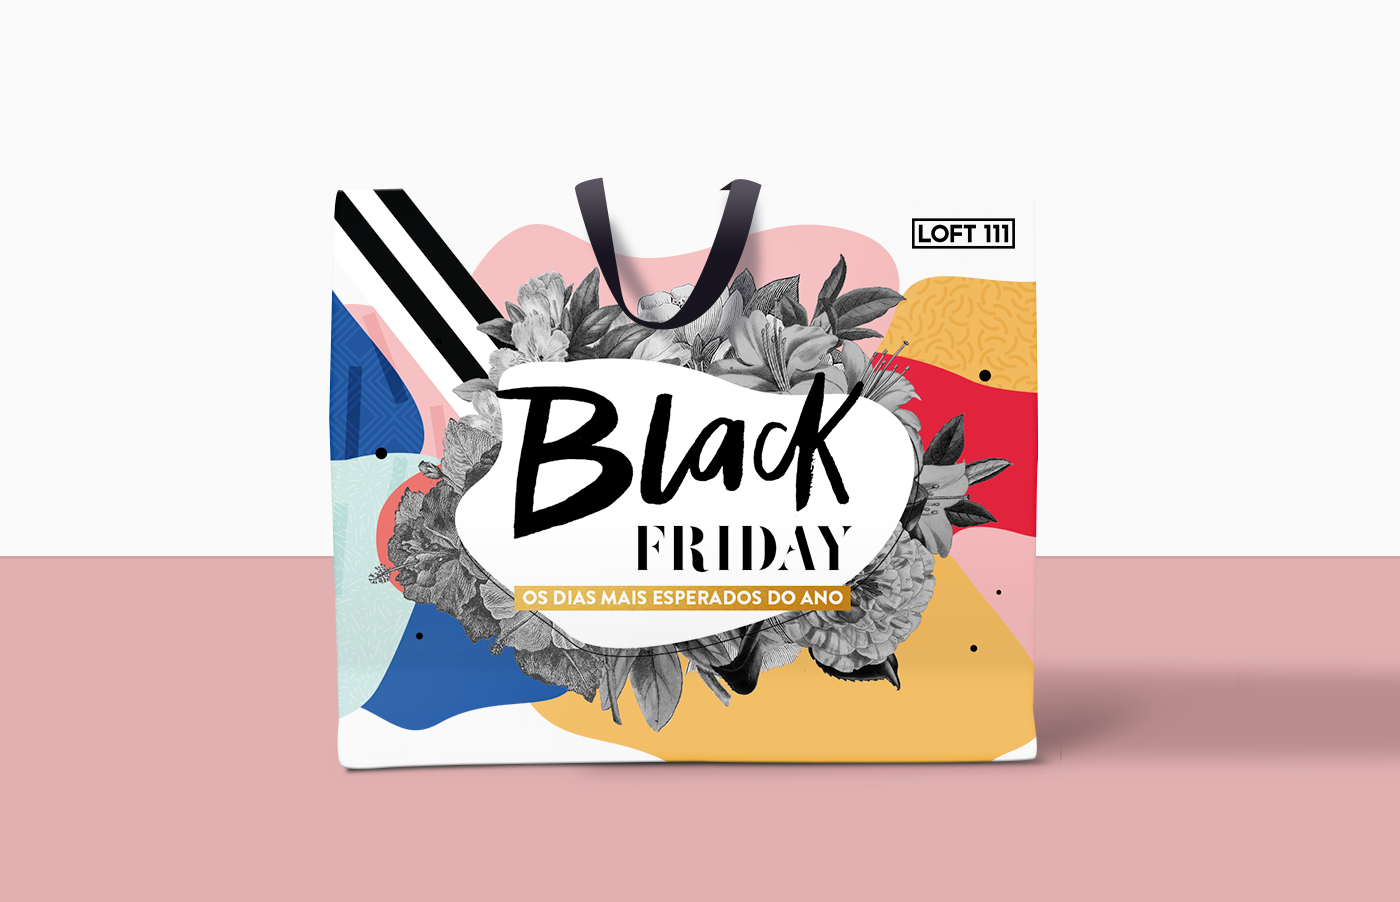 defc42bbe Black Friday me! on Behance